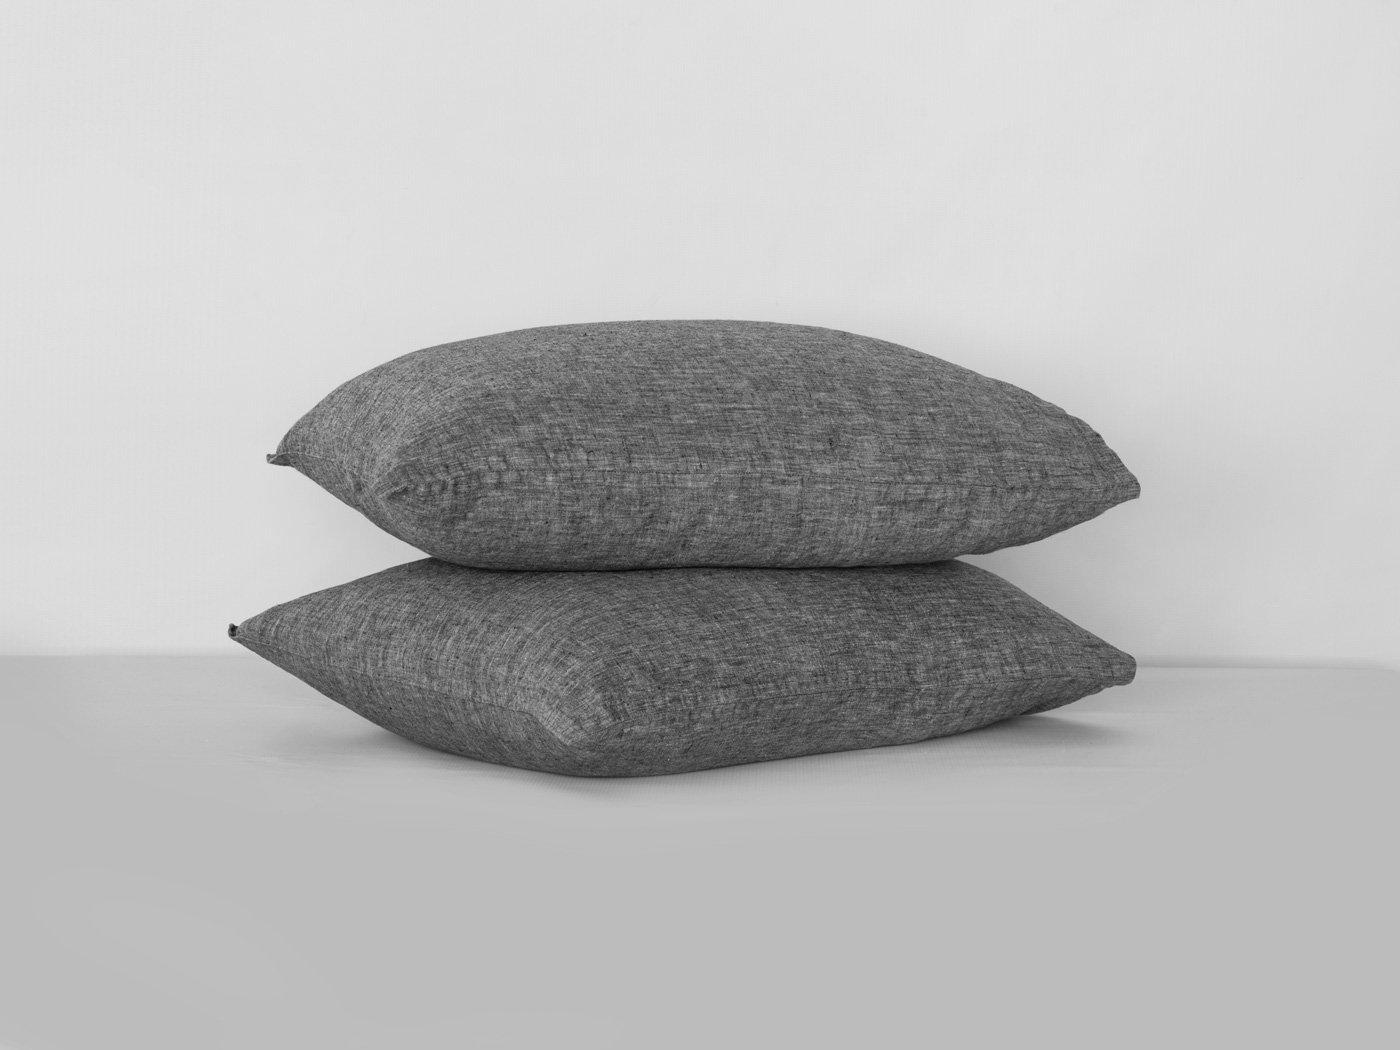 BEALINEN Linen Pillowcases Shams 2 pcs Inside Pocket Closure Size Euro Square 26''x26'' Dark Stone Gray Color Washed Softened European Linen